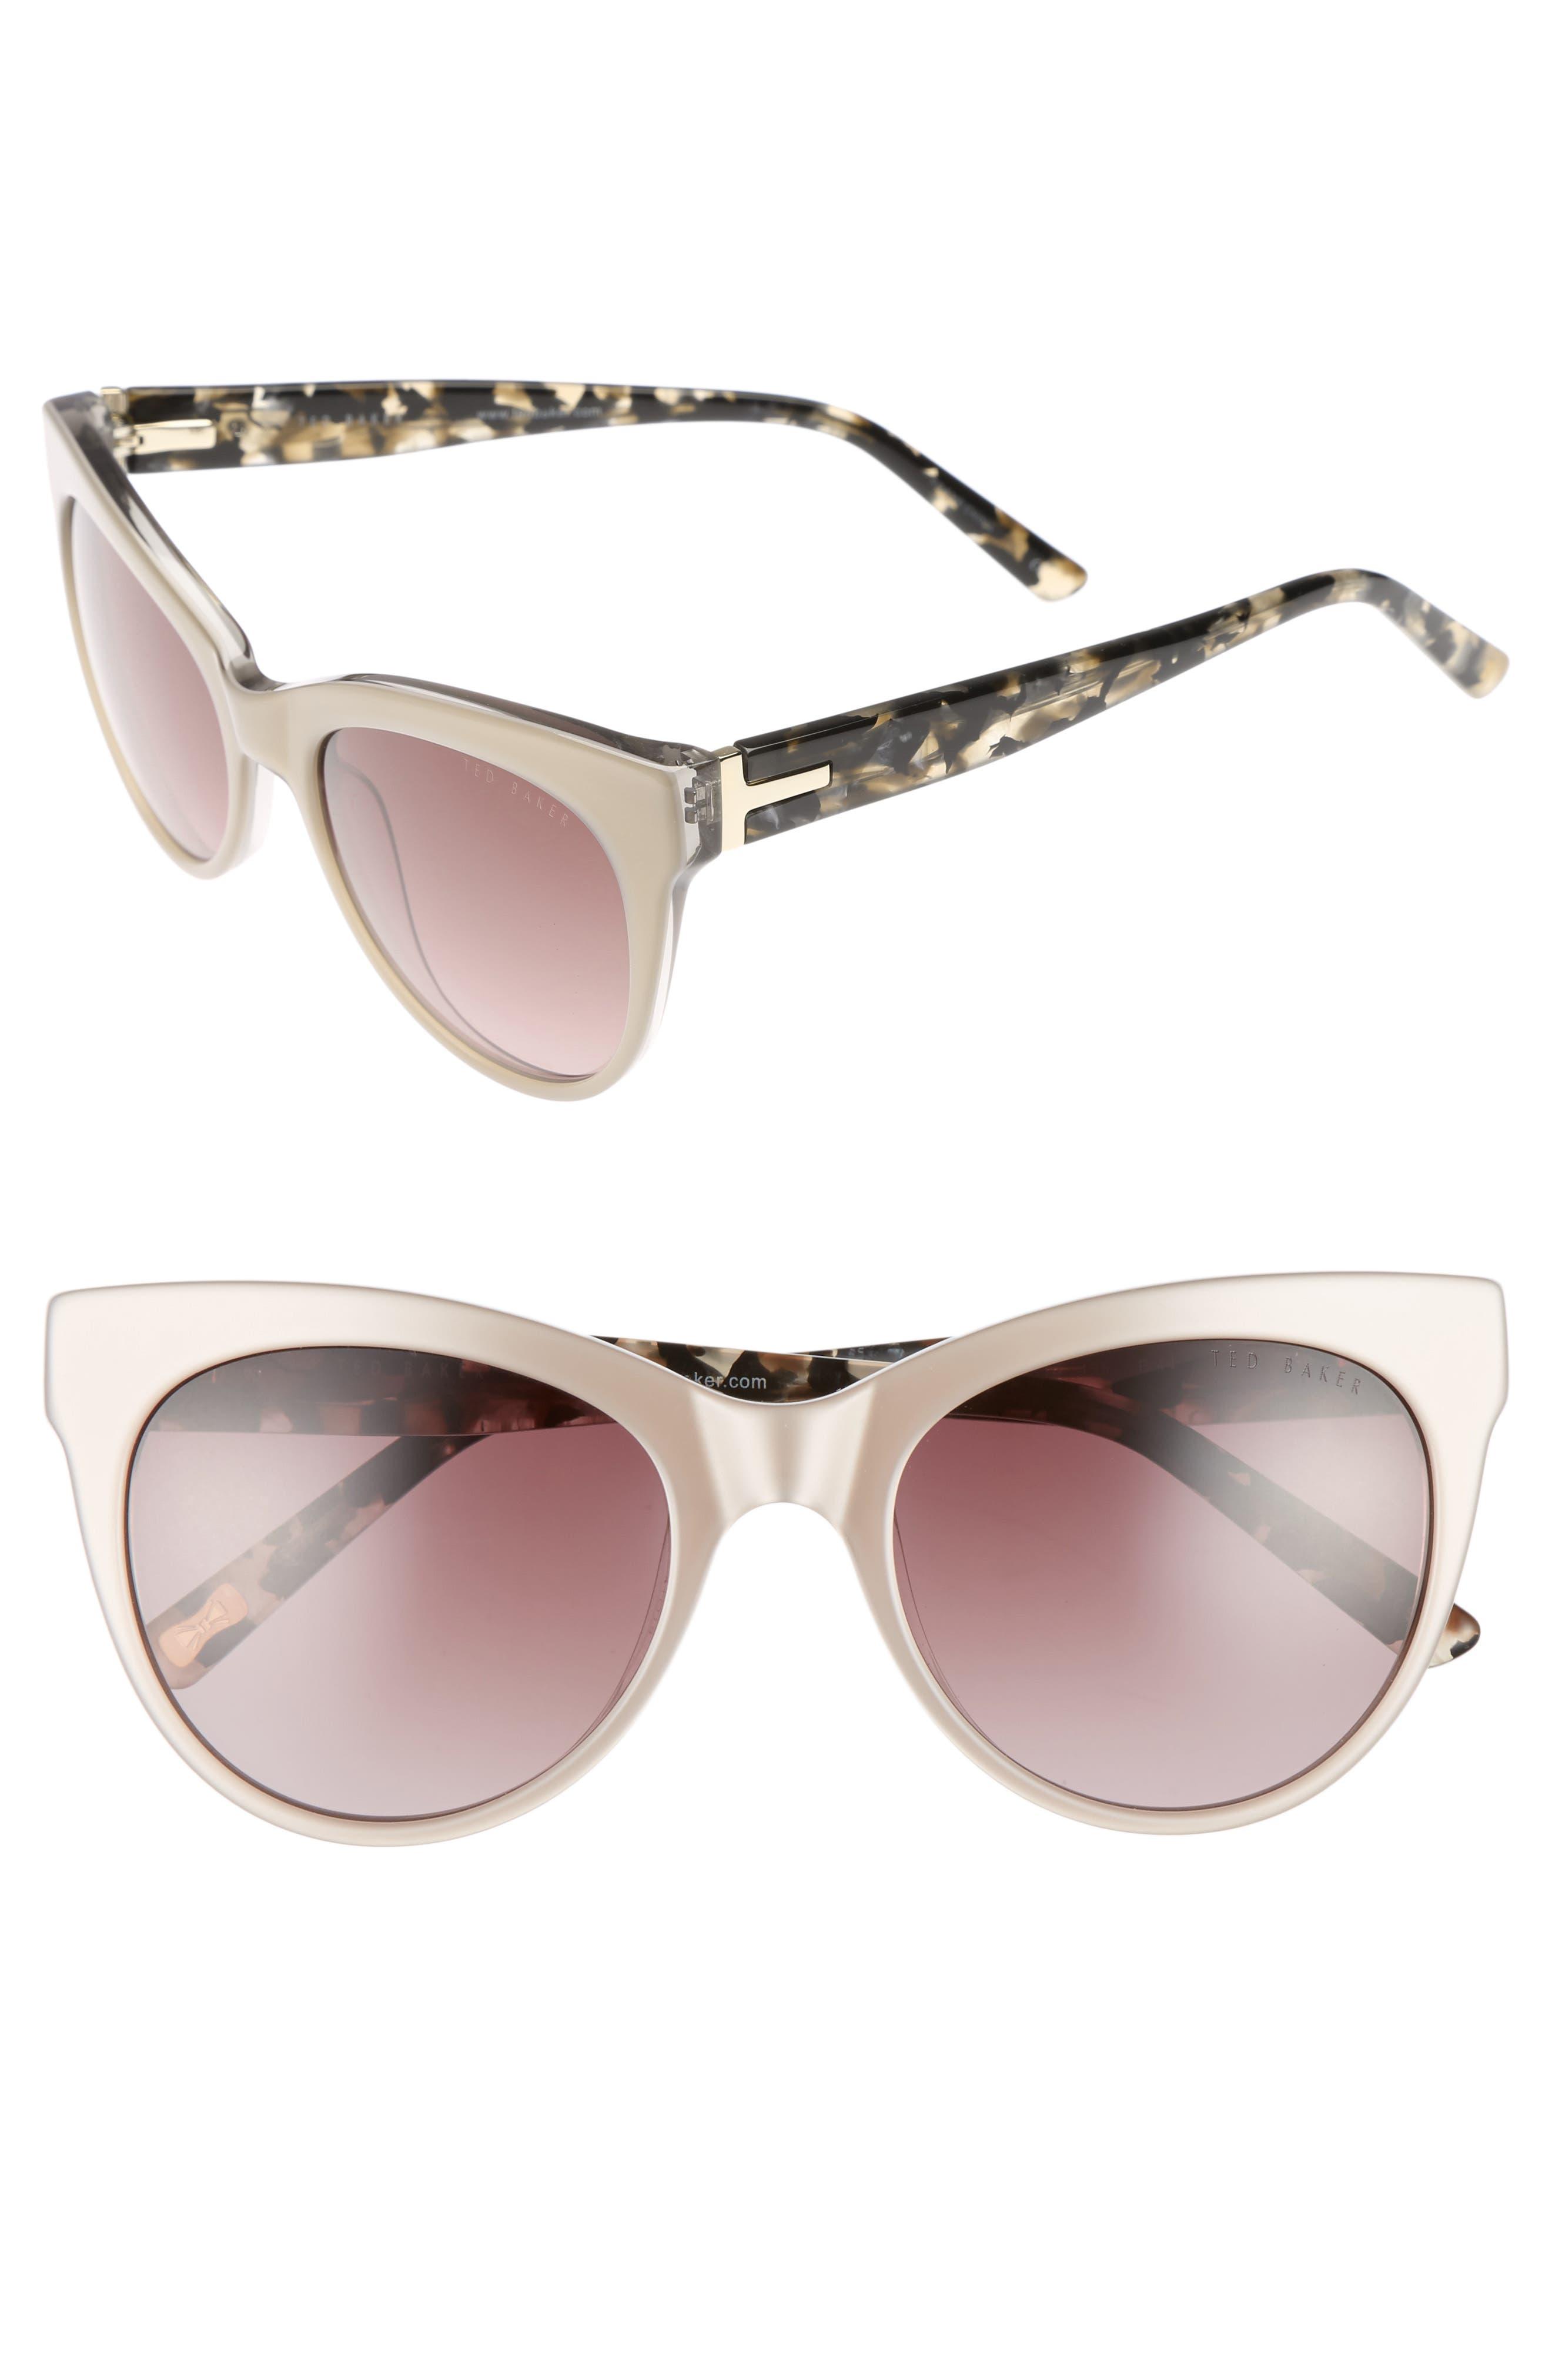 51mm Cat Eye Sunglasses,                             Main thumbnail 1, color,                             200